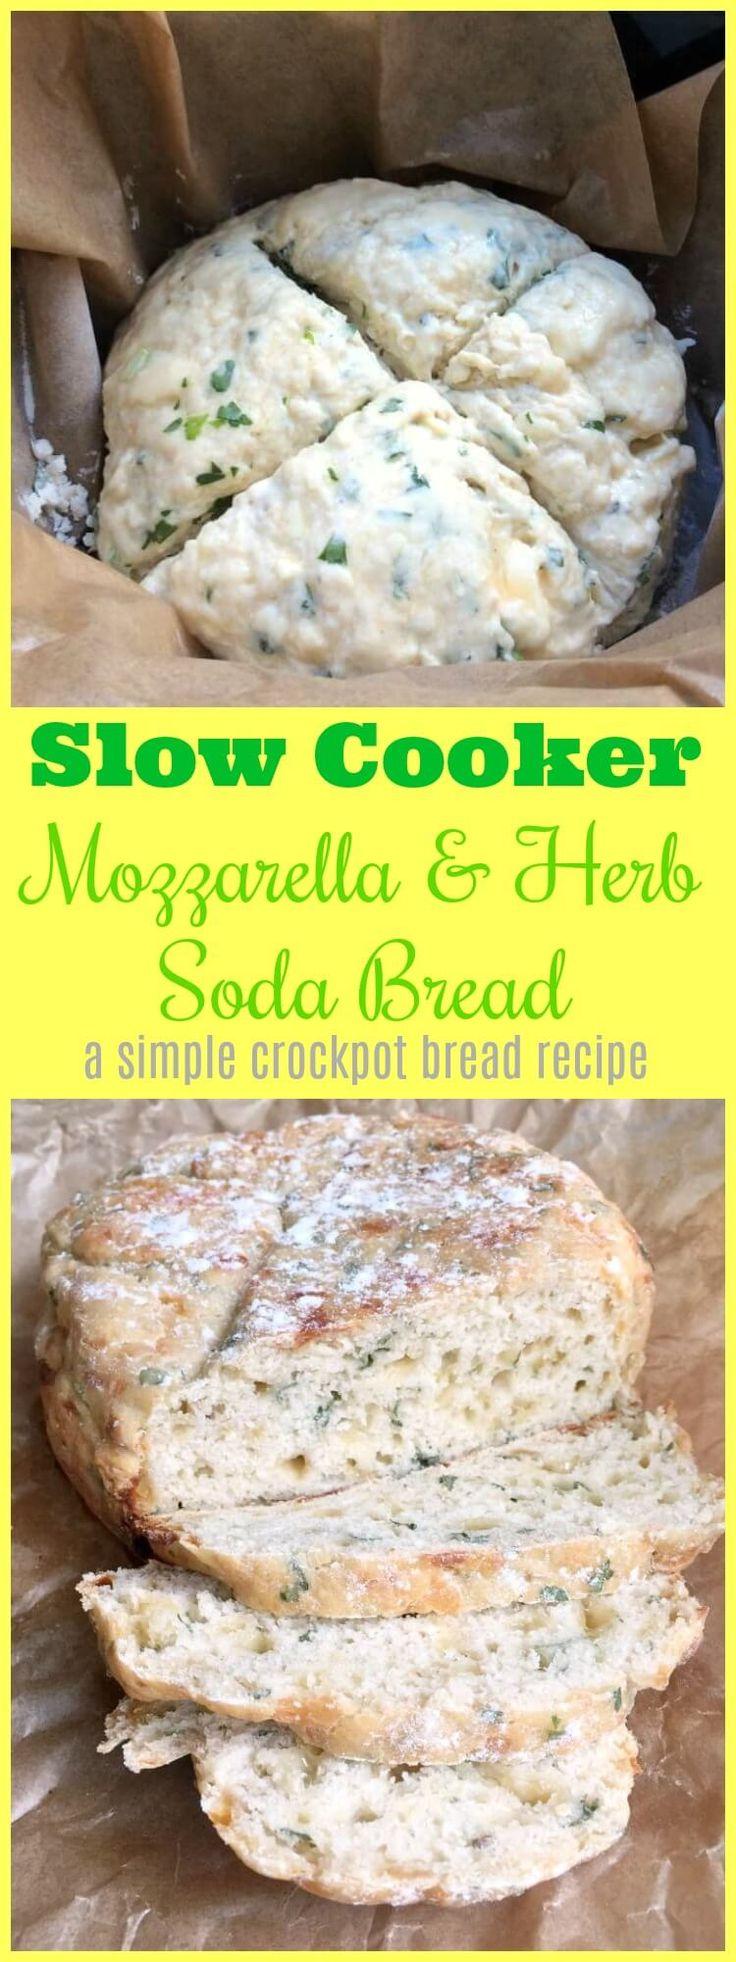 How to make slow cooker mozzarella and herb soda bread - a simple crockpot bread recipe